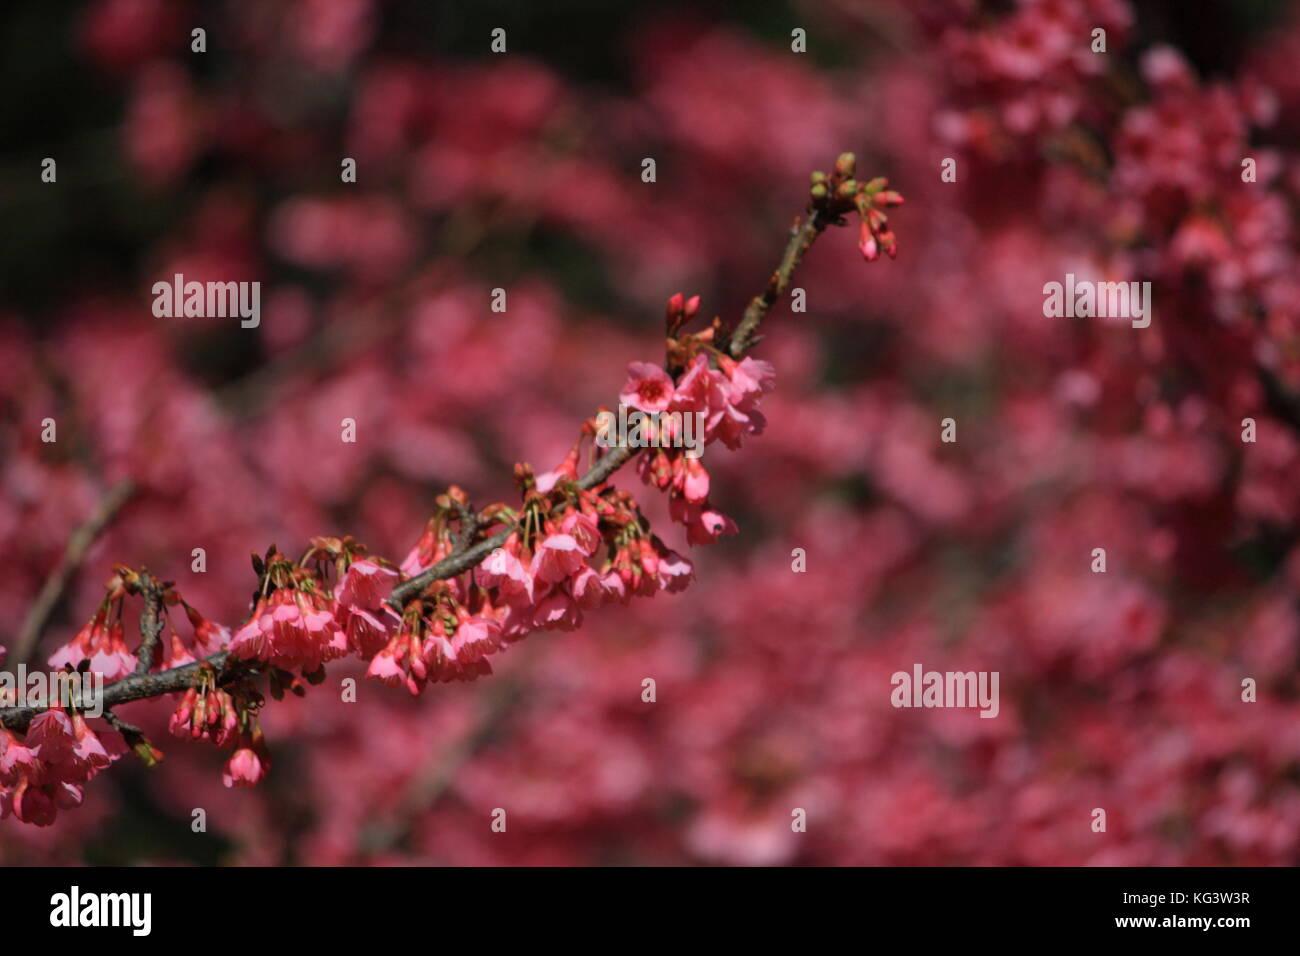 Rosa Blume. Chinesische Pflaume, Japanische Aprikose. Prunus japanische Aprikose Stockbild